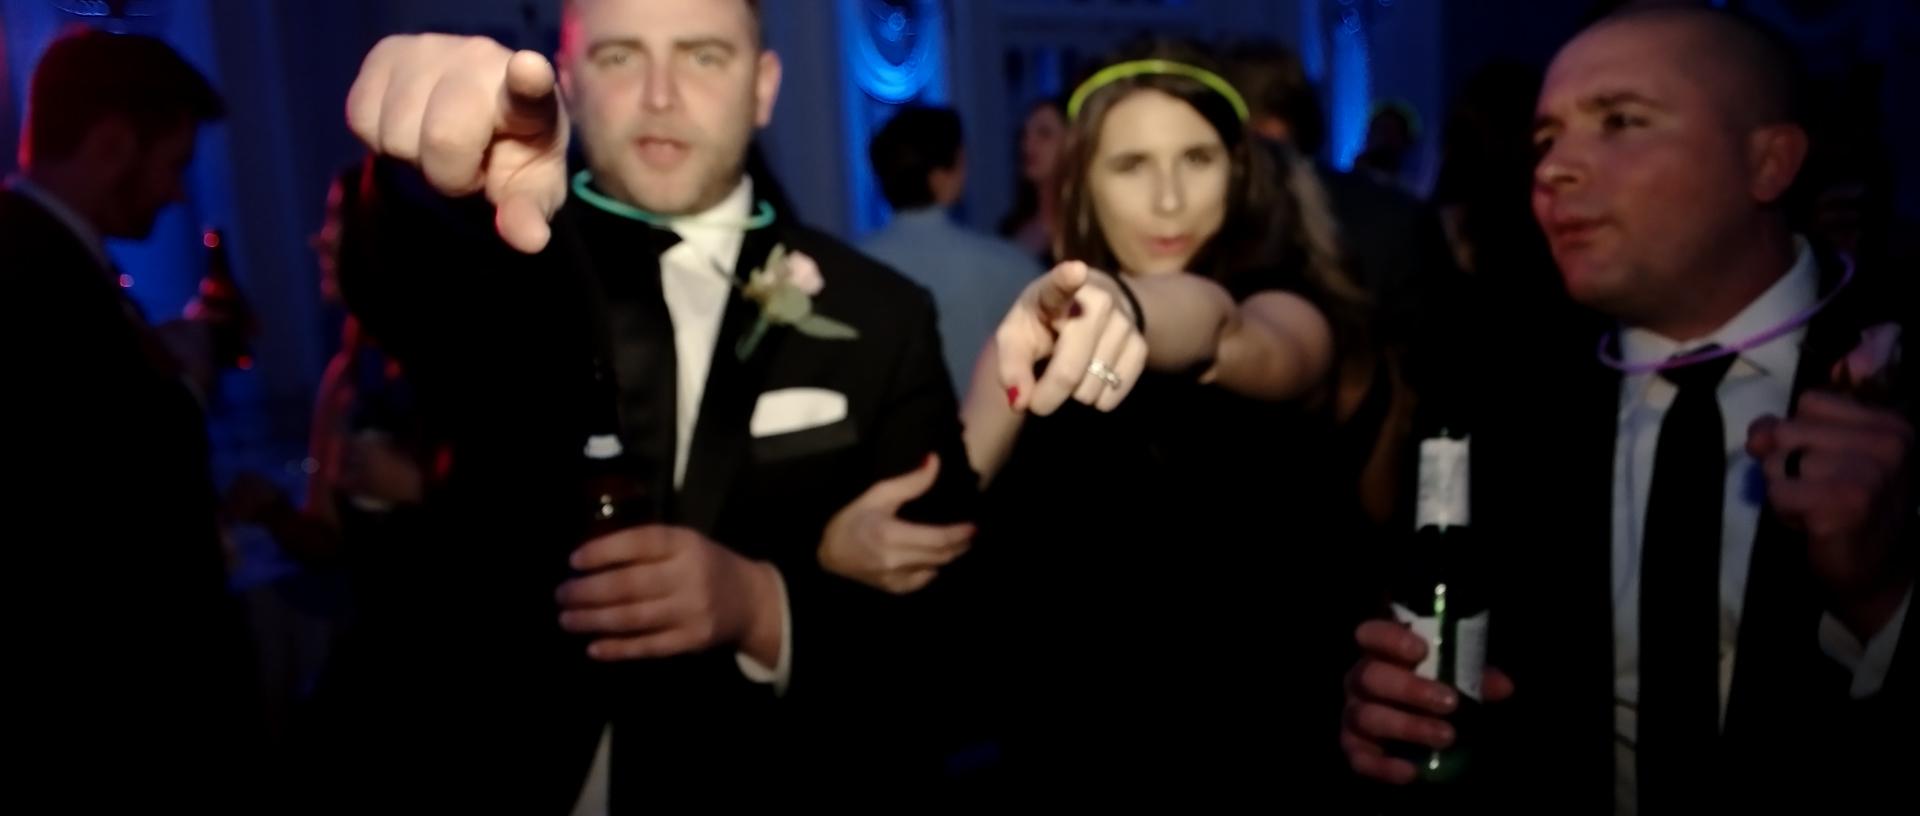 Atlanta Wedding Videographer0040.jpg